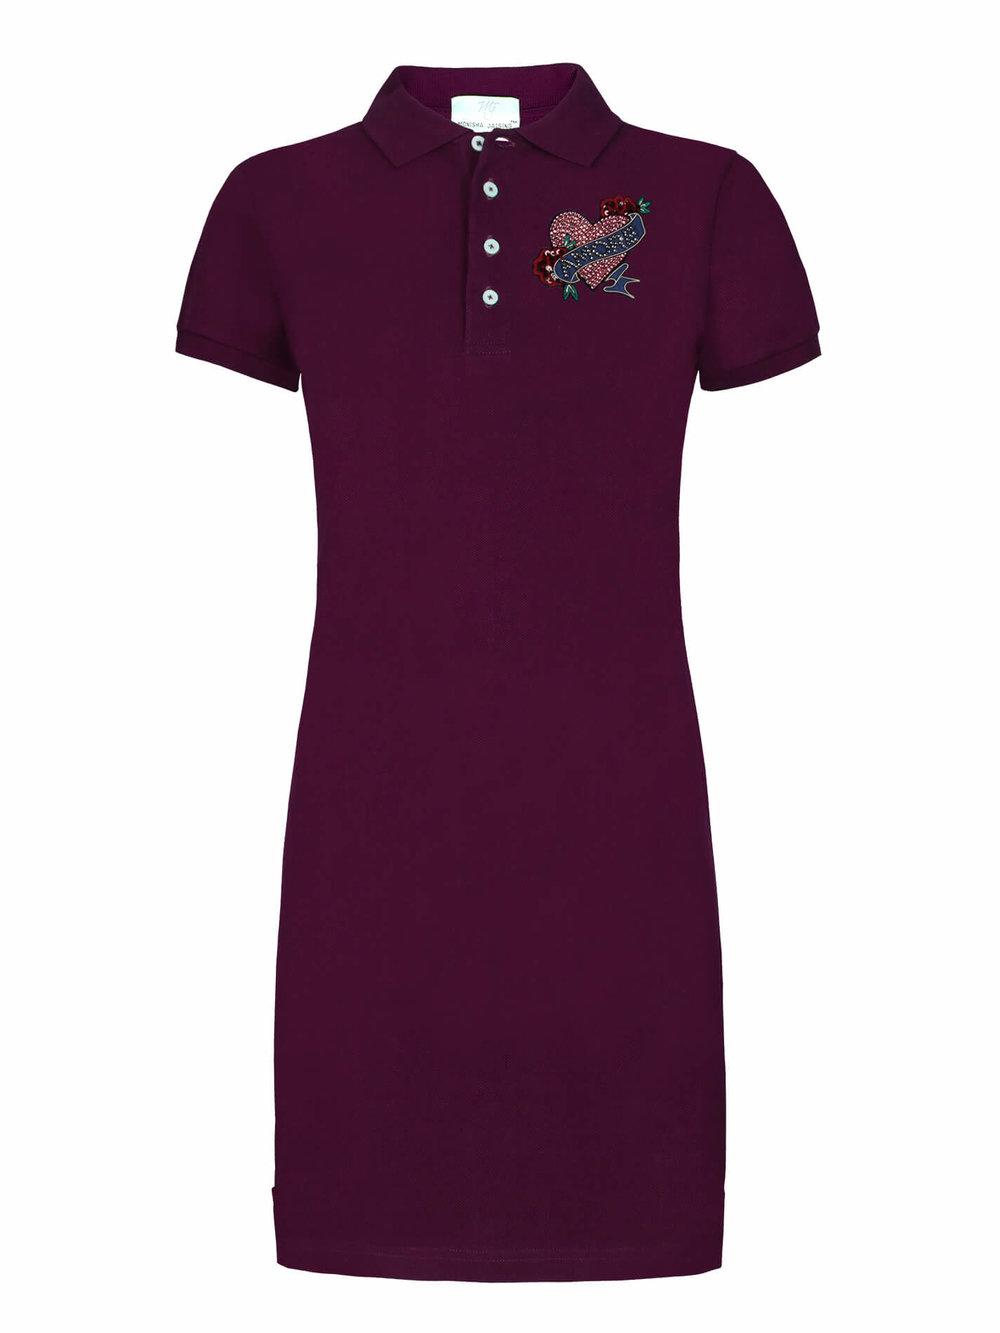 wine amore dress.jpg